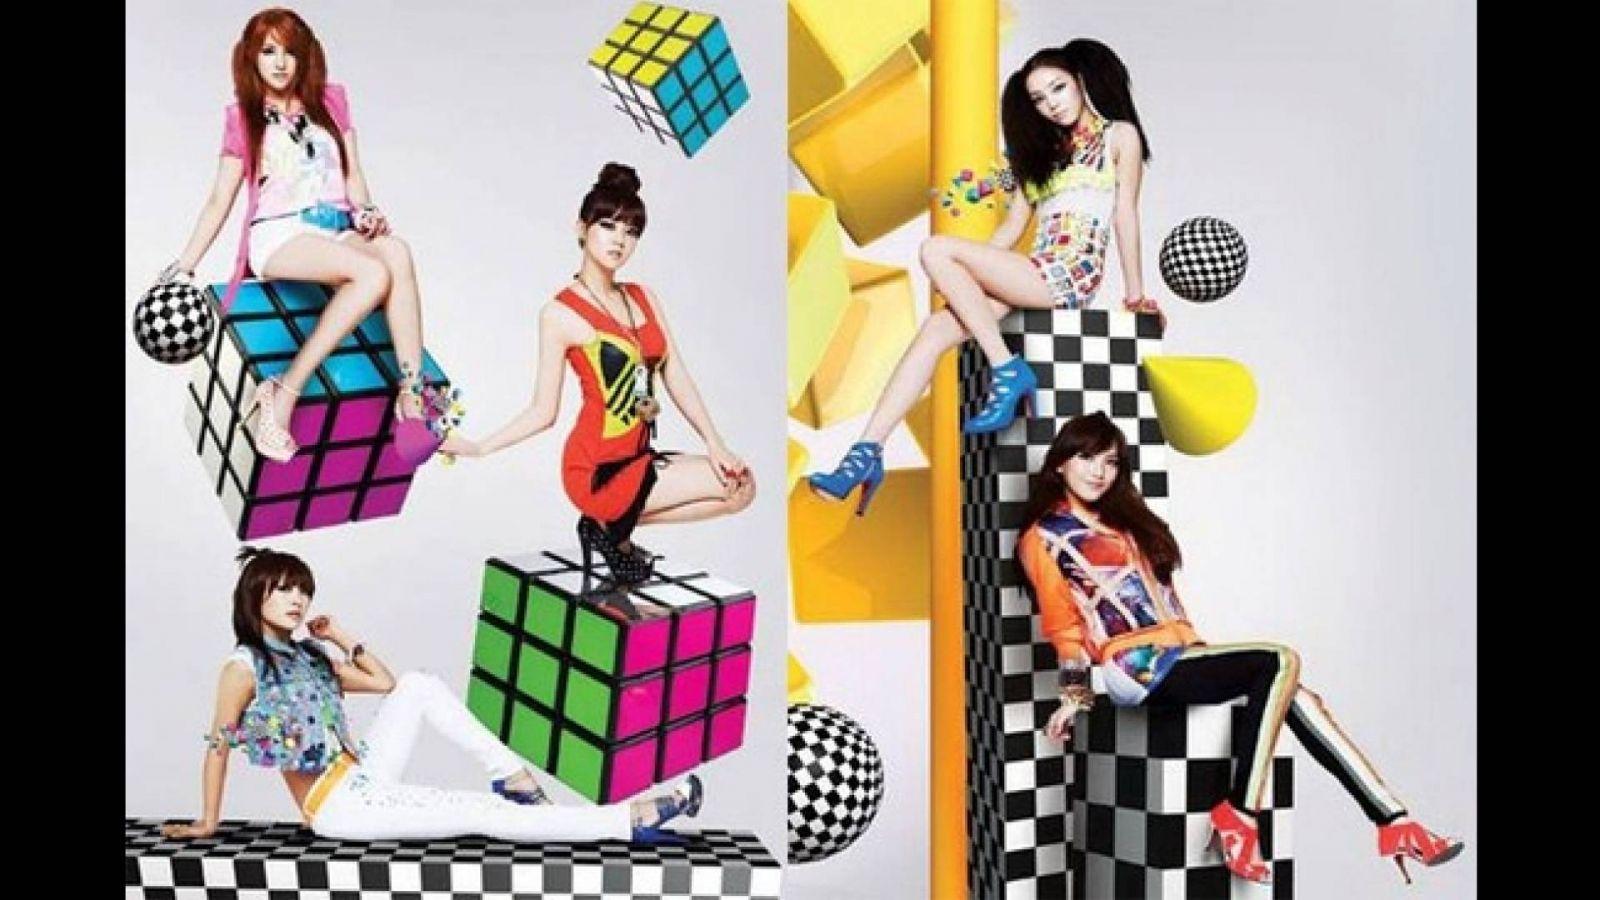 KARAn ensimmäiset konsertit Koreassa © DSP Media